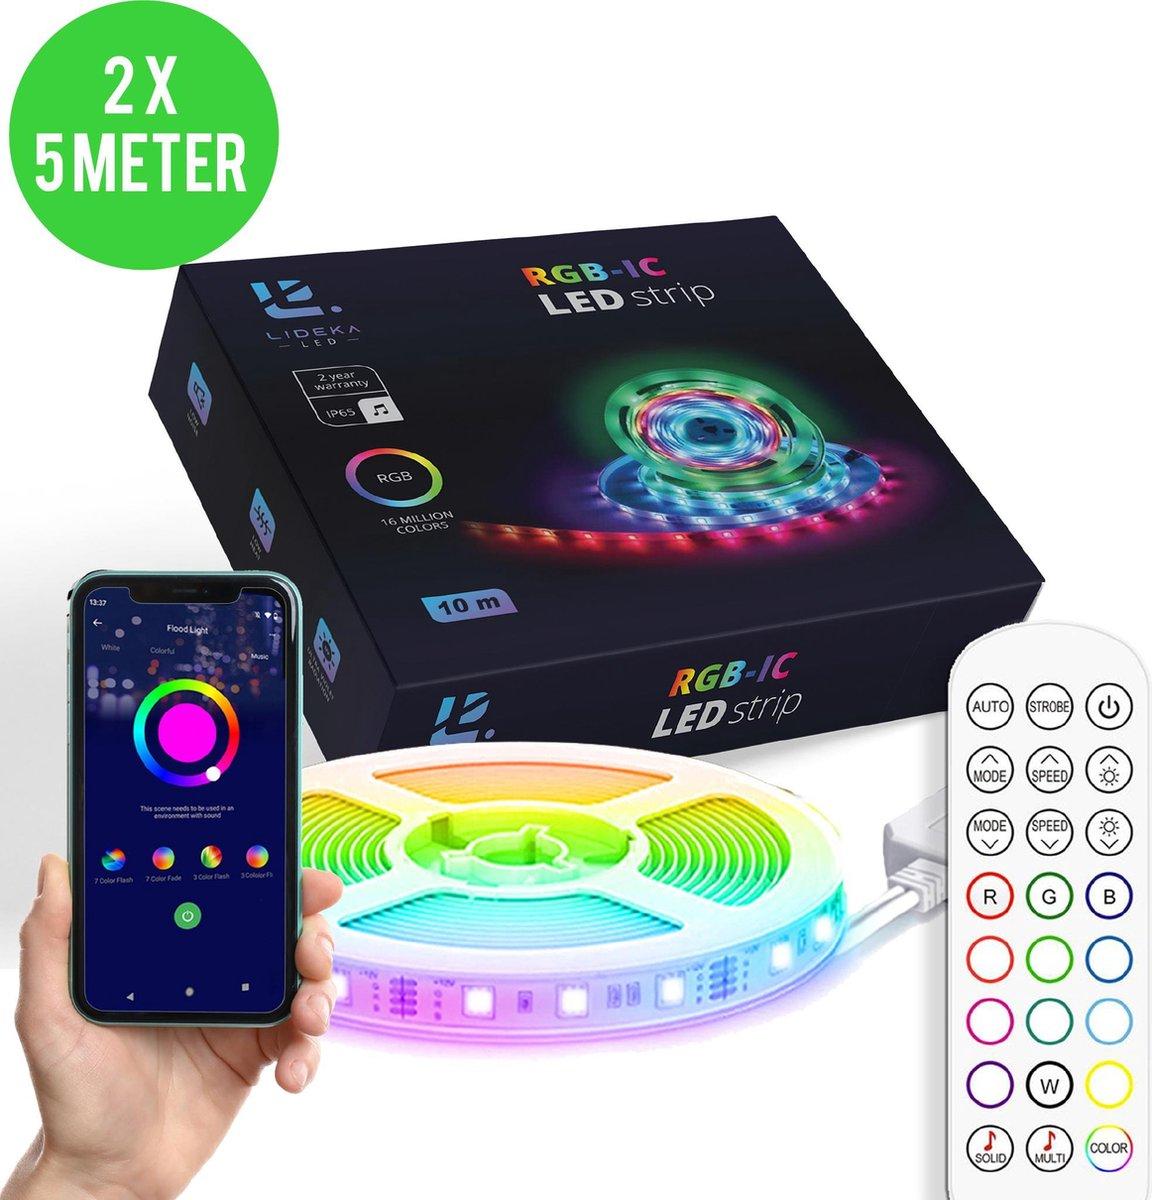 Lideka Dreamcolor Led Light strip - 10 meter (2x5) - RGB-IC Smart Led Verlichting - Incl App en Afstandsbediening